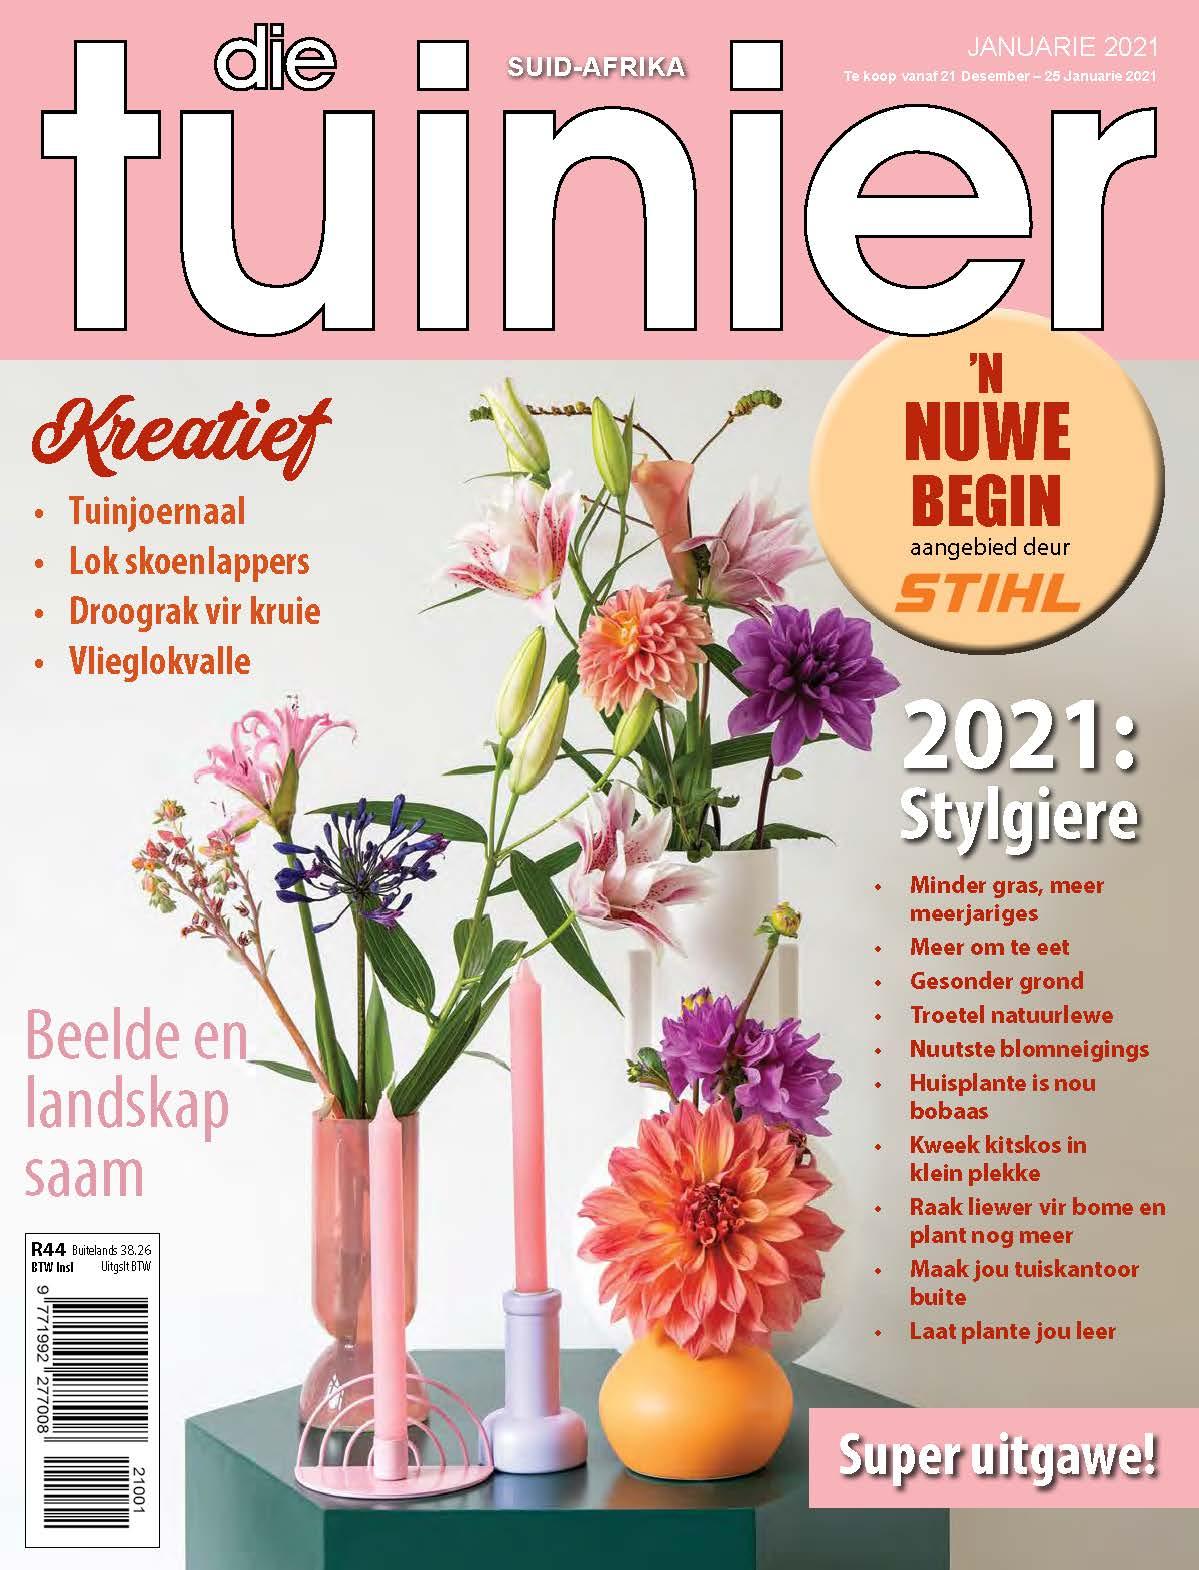 DT Mag